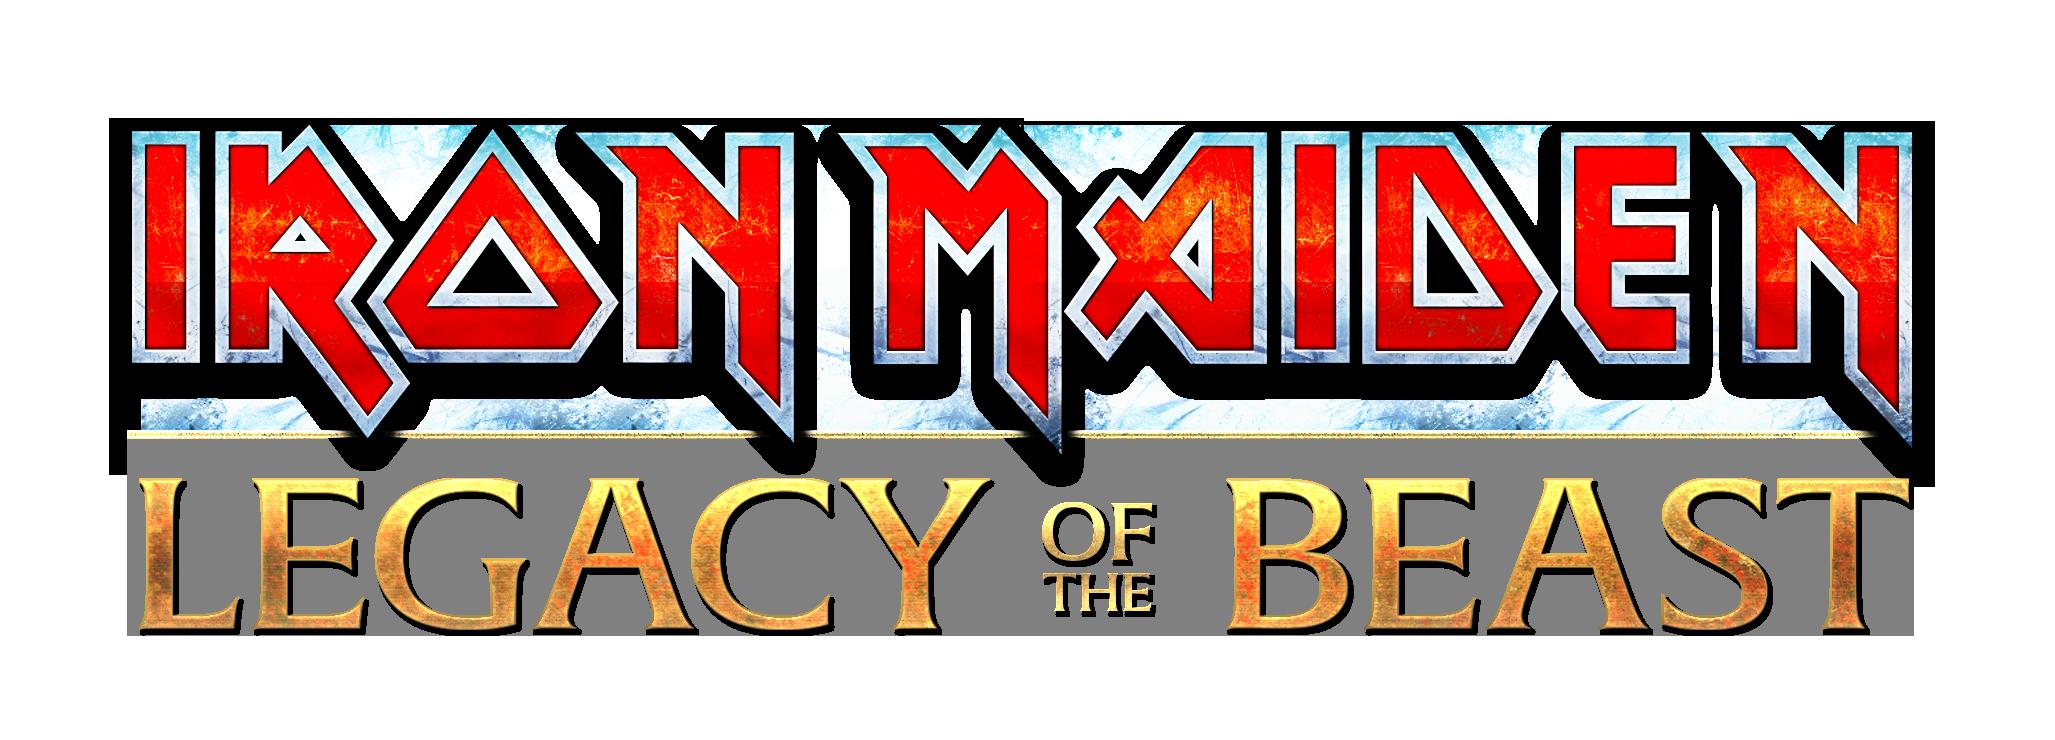 Iron Maiden Logos